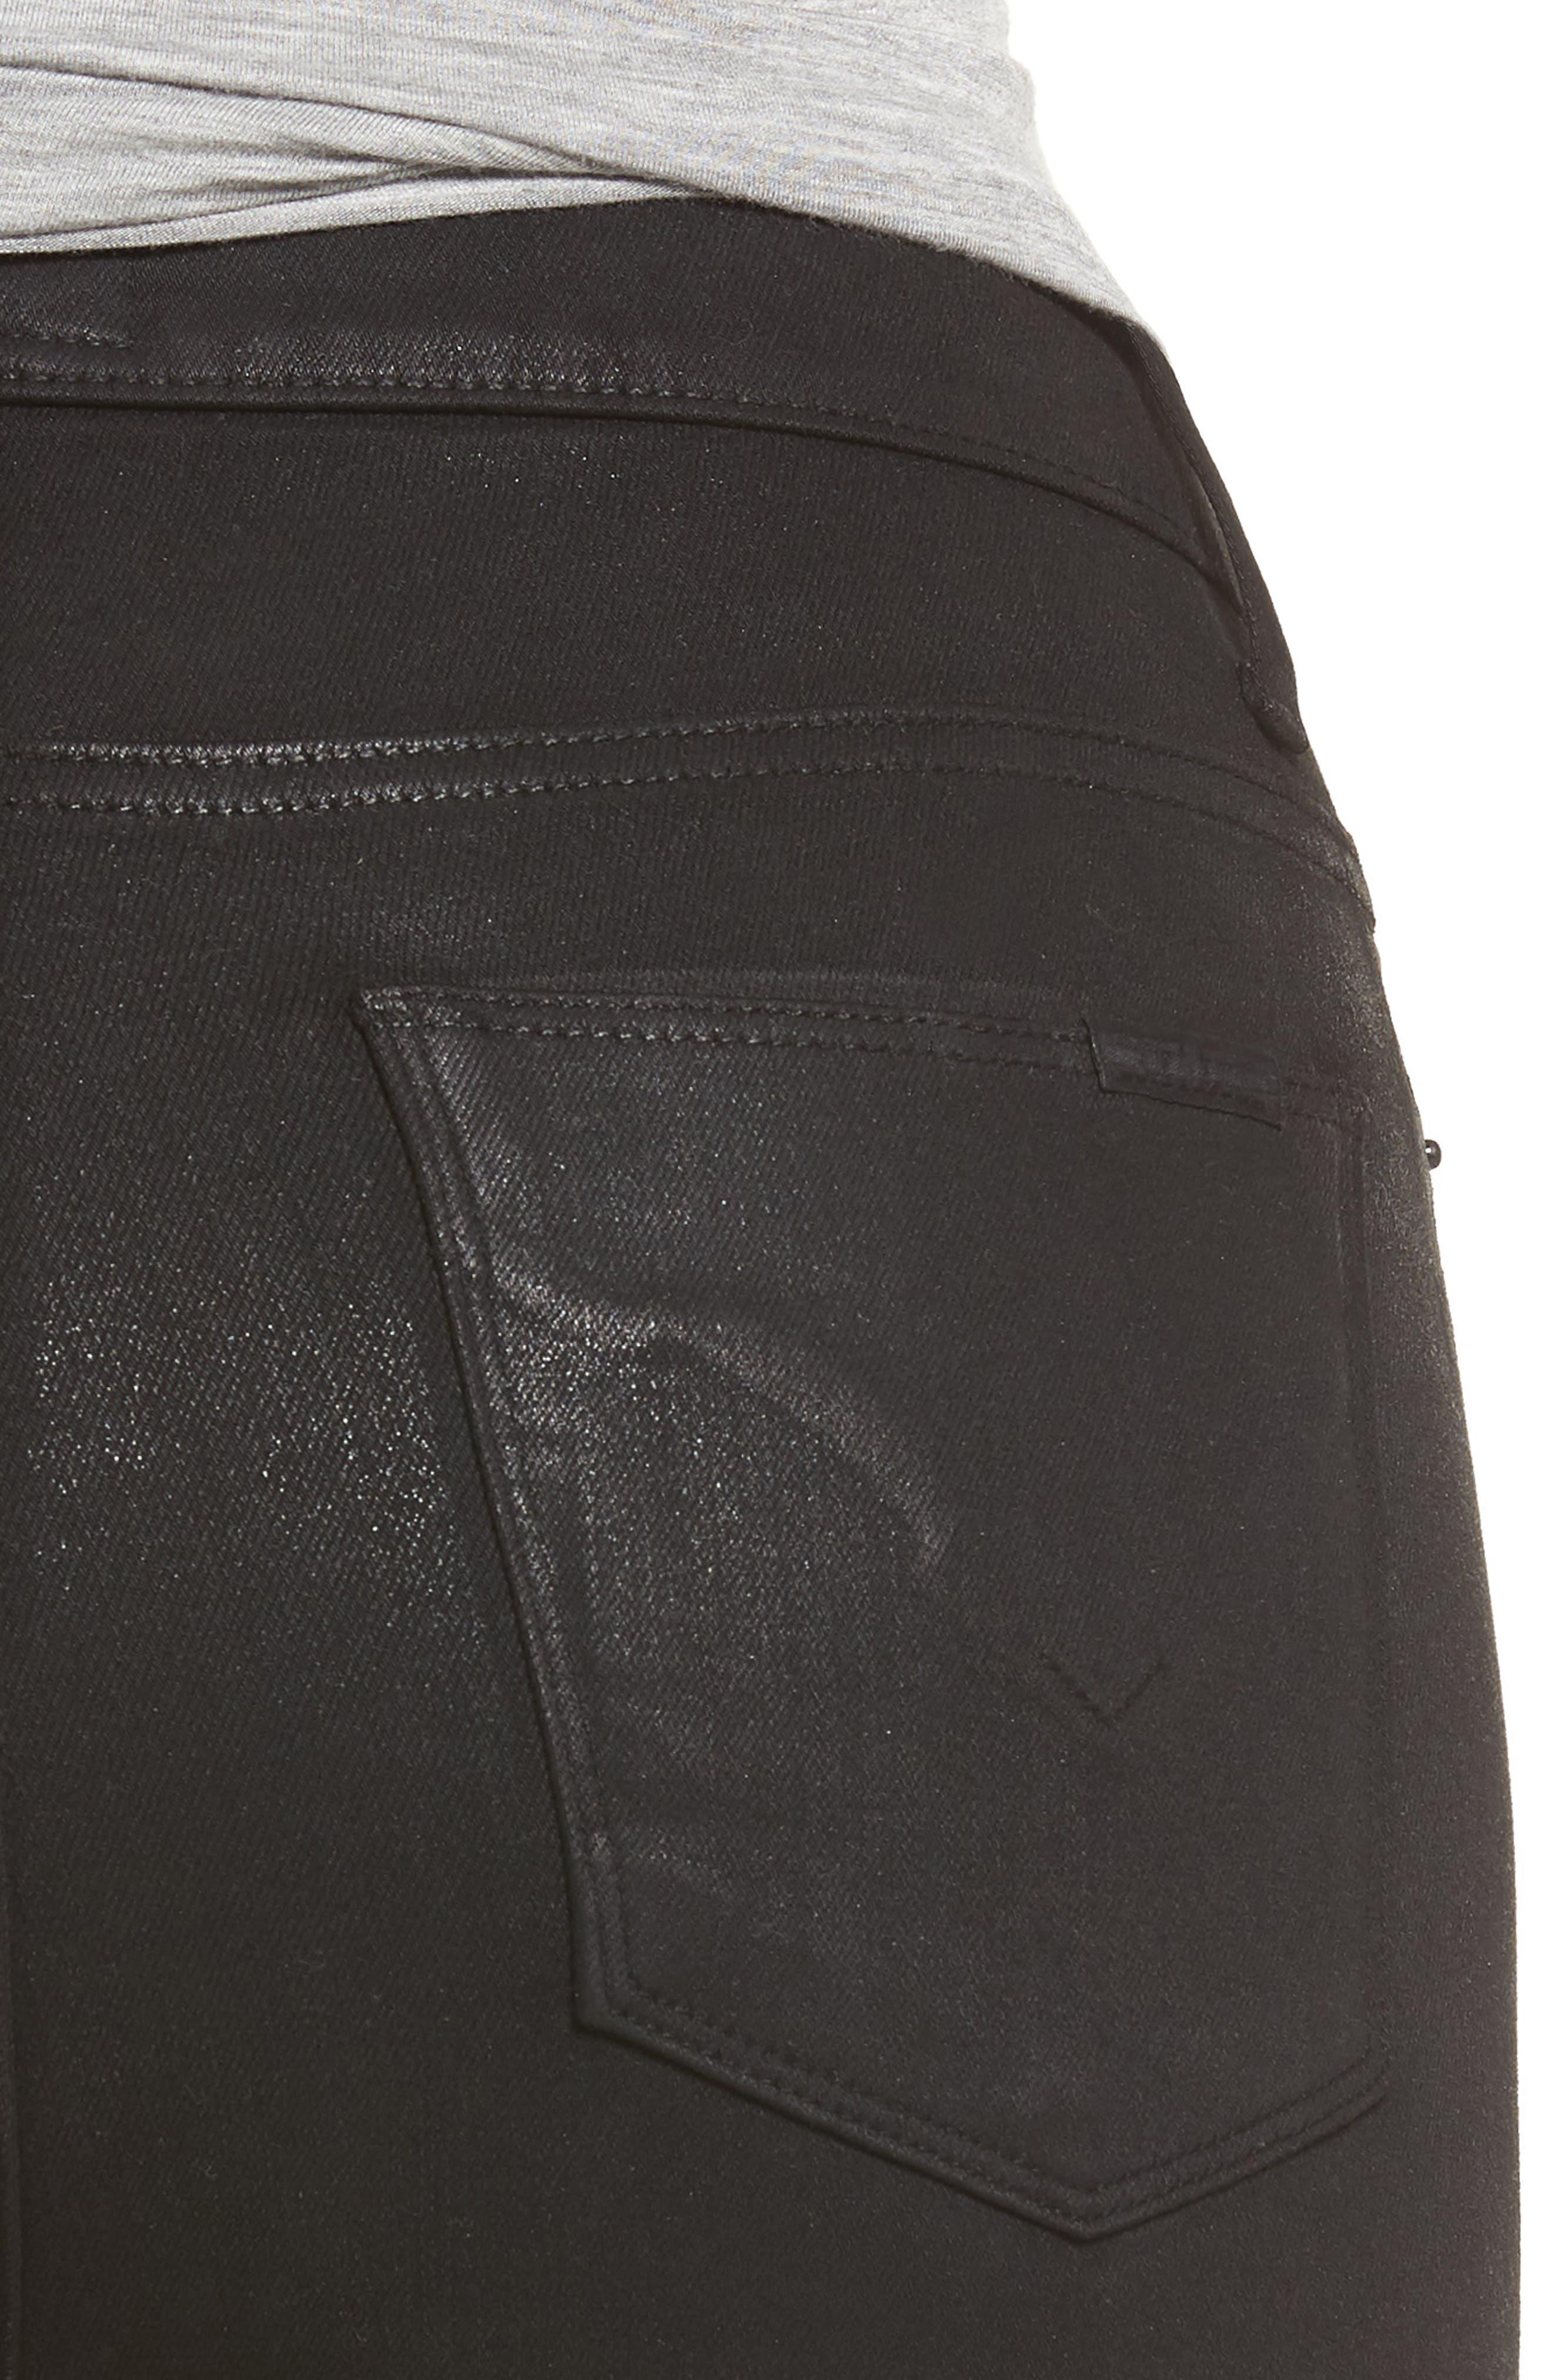 Barbara High Waist Skinny Jeans,                             Alternate thumbnail 4, color,                             Noir Coated